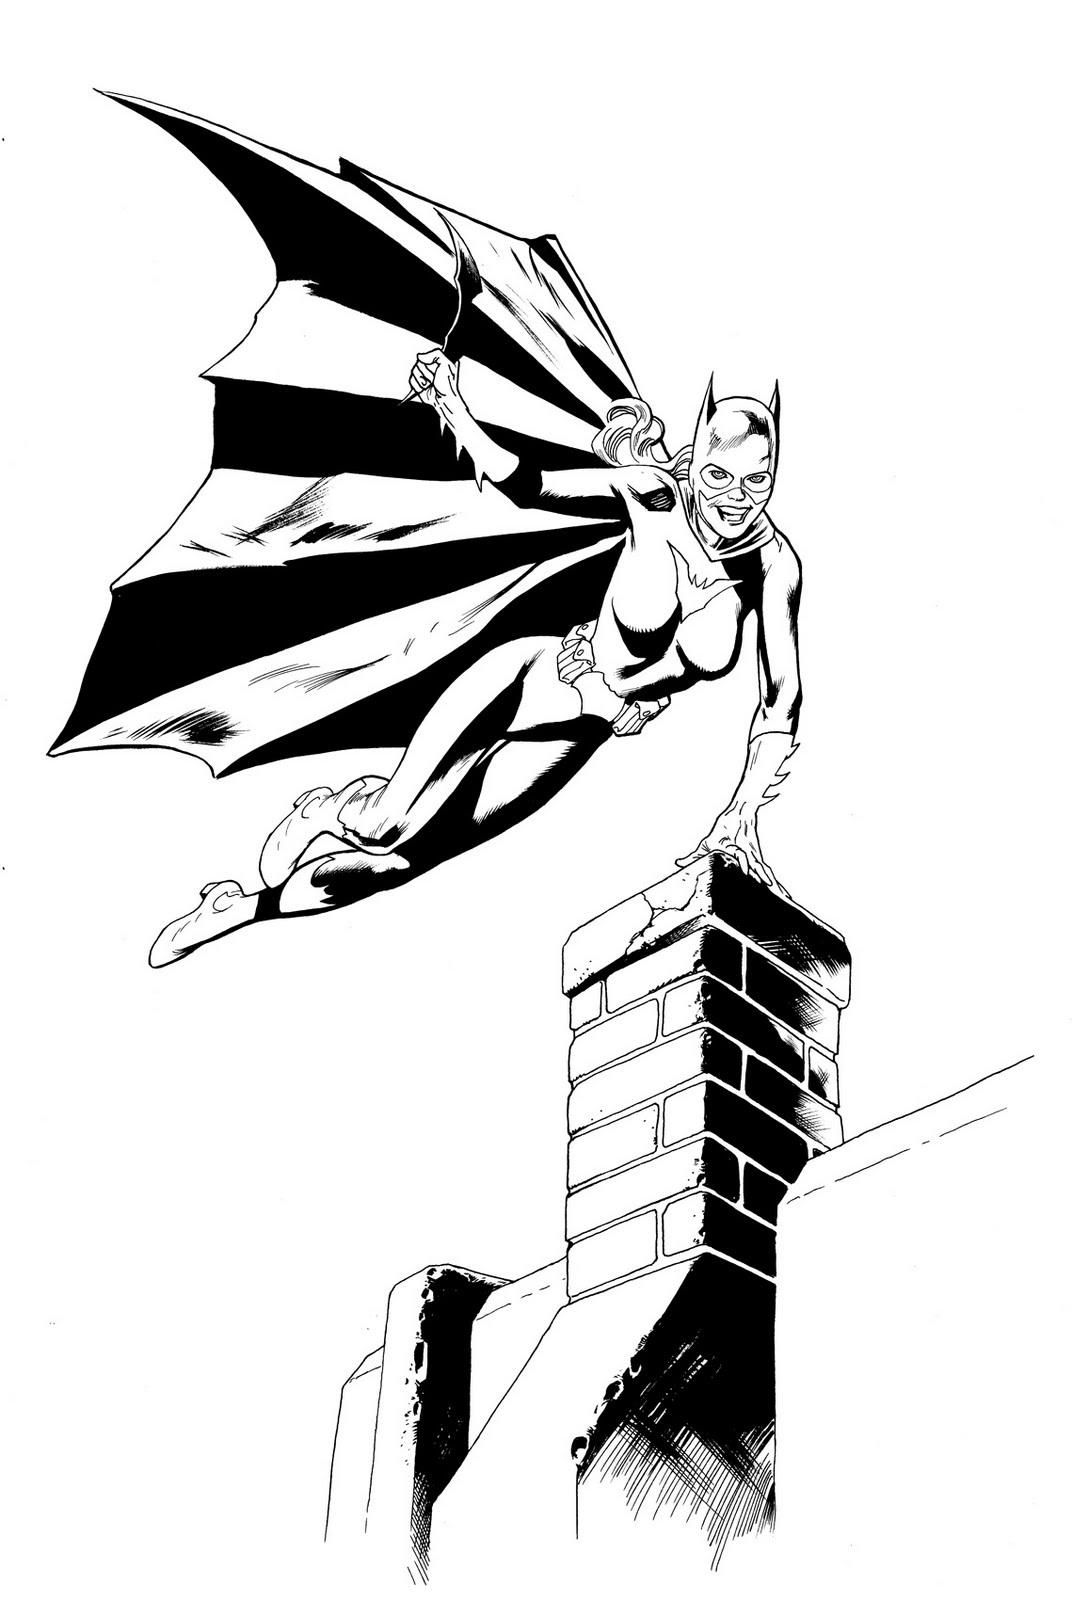 Free Printable Batgirl Coloring Pages For Kids | Superhero ... | 1600x1072